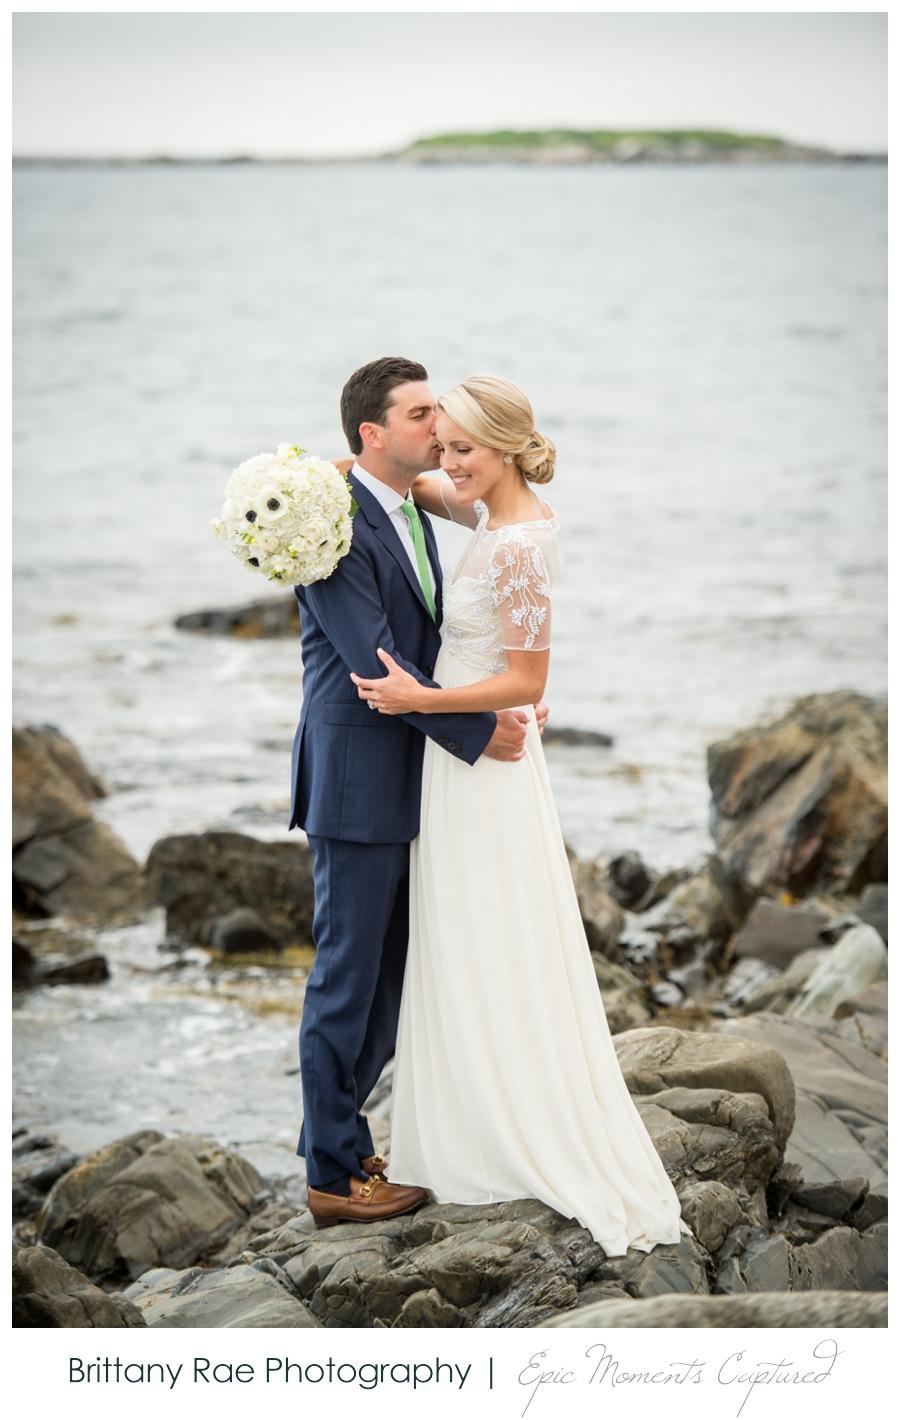 072515-Tory-Andy-Bois-Wedding-158_WEB-Maine-Wedding-and-Portrait-Photographer.jpg